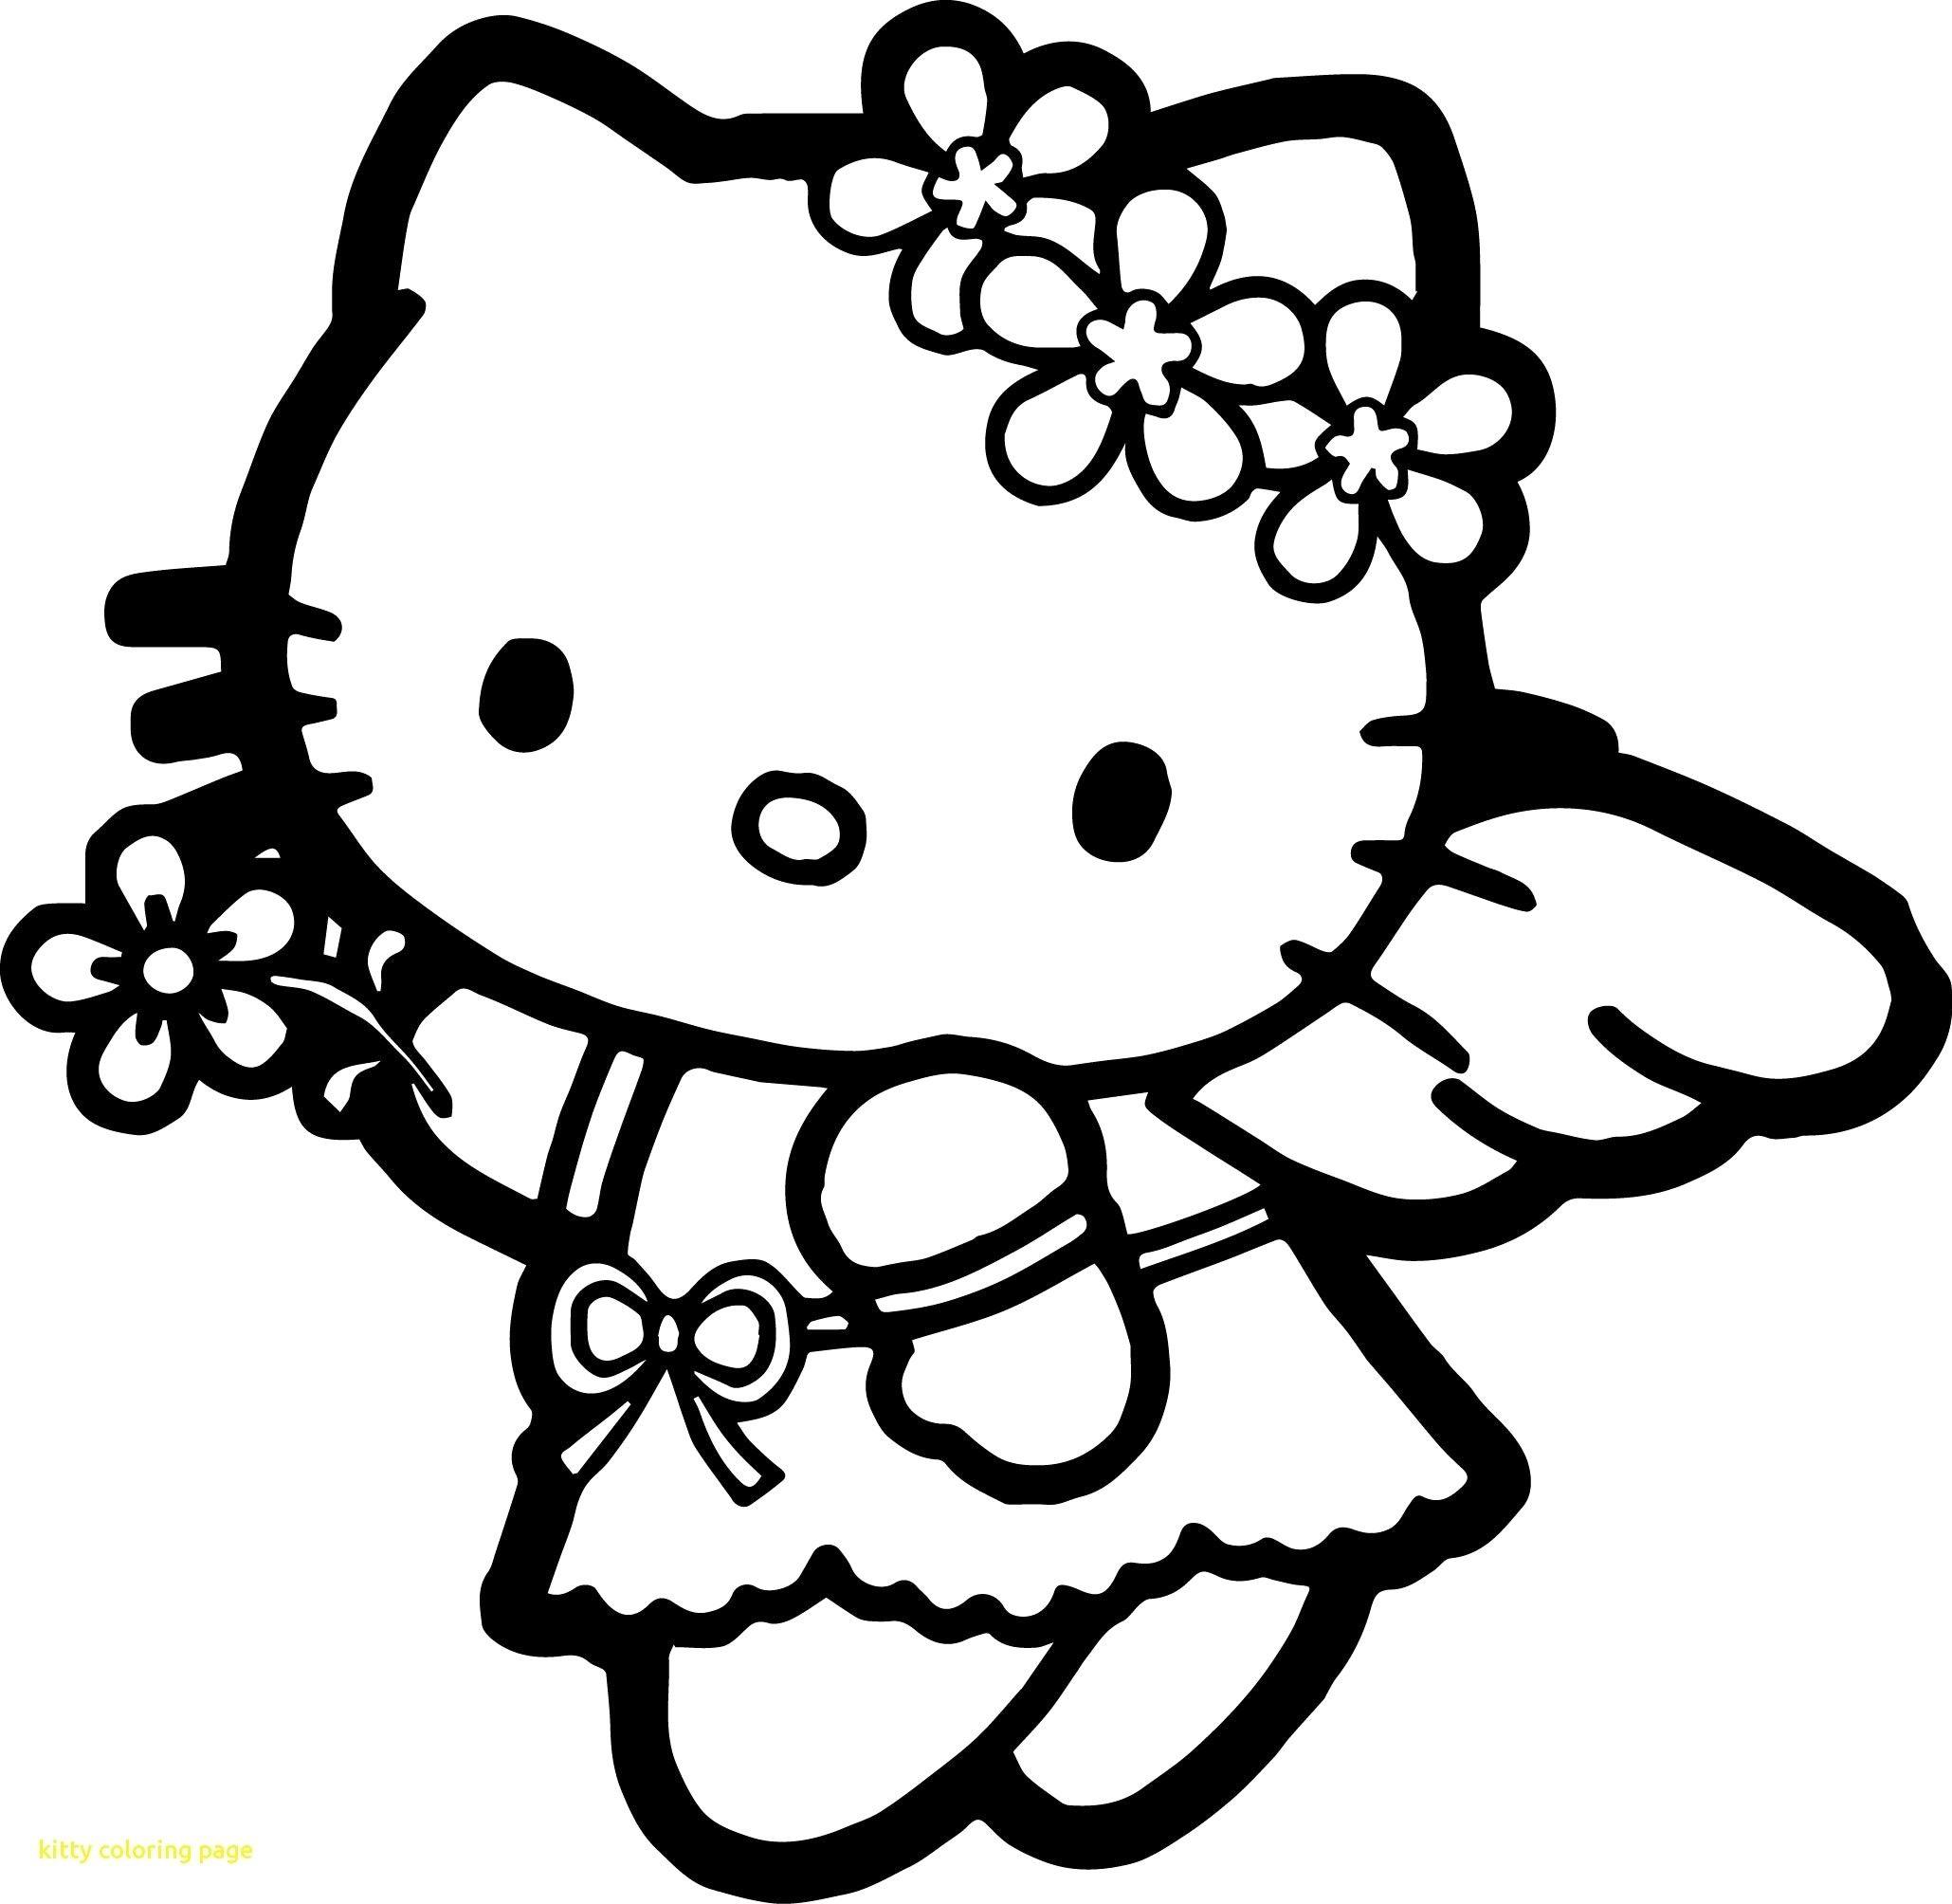 Hello Kitty Coloring Book Pdf Download Hello Kitty Coloring Book Pdf Download